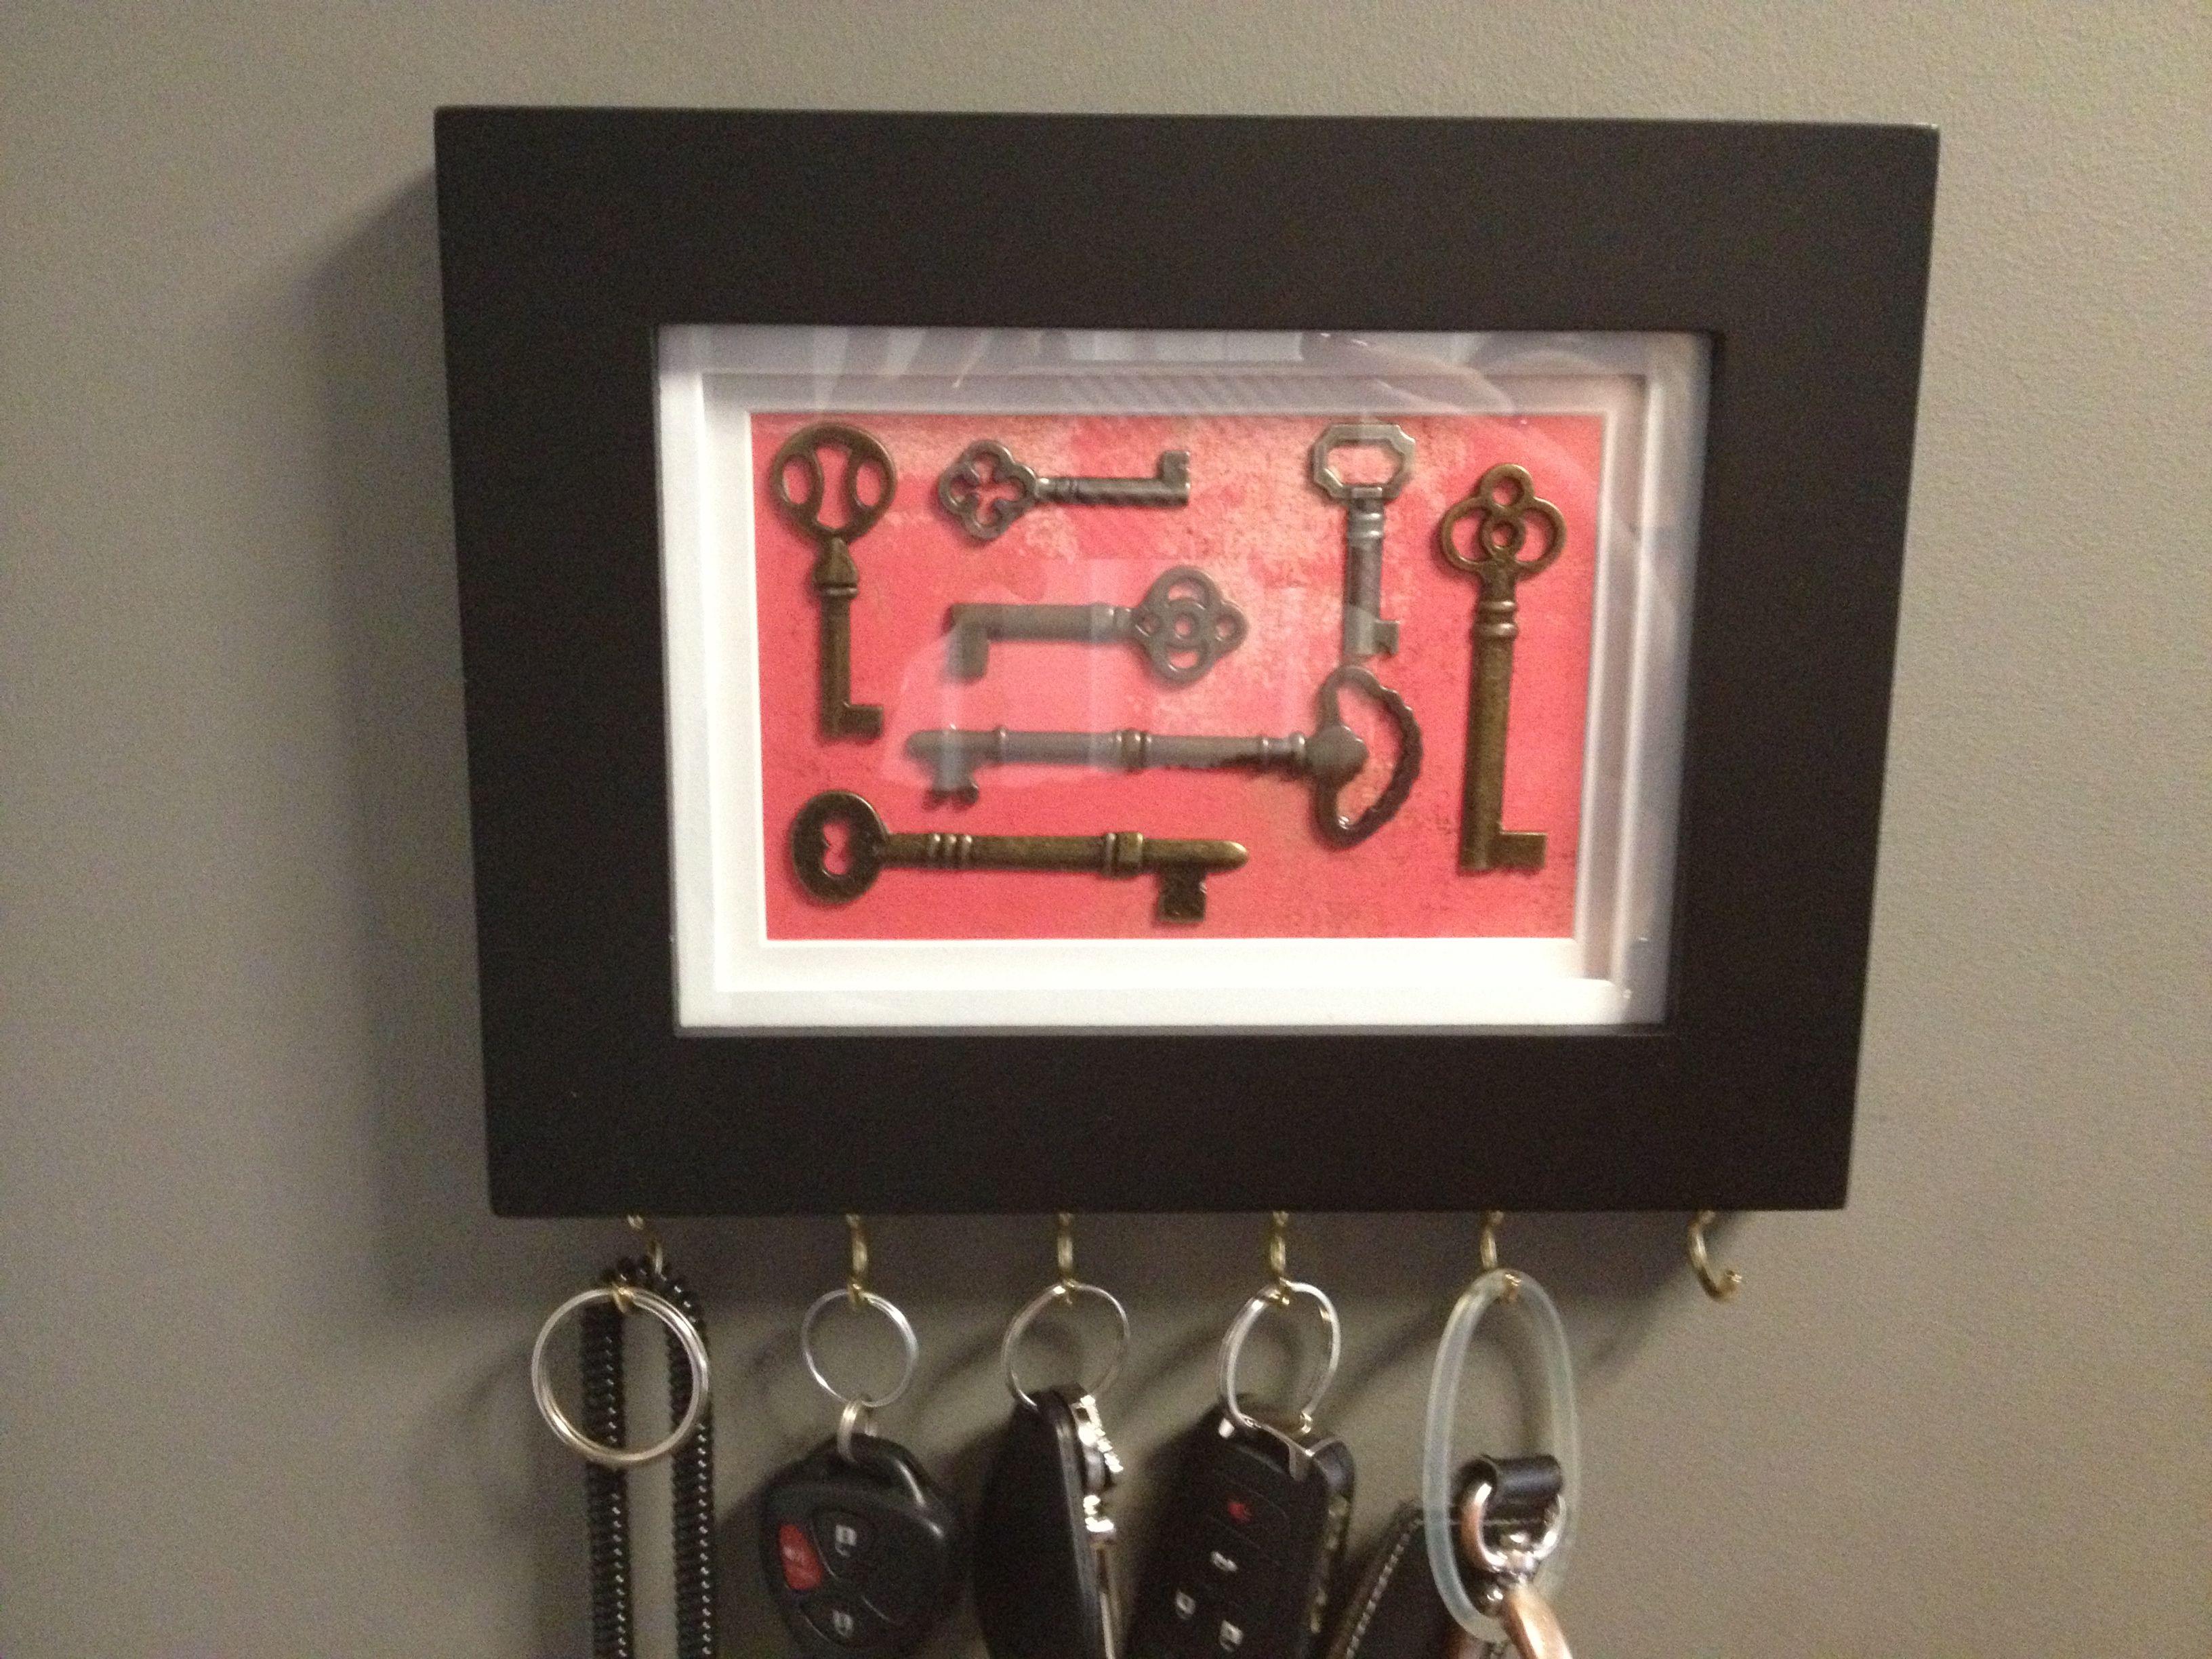 DIY key rack. Frame + hooks + scrapbook paper + decorative metal keys =  quick